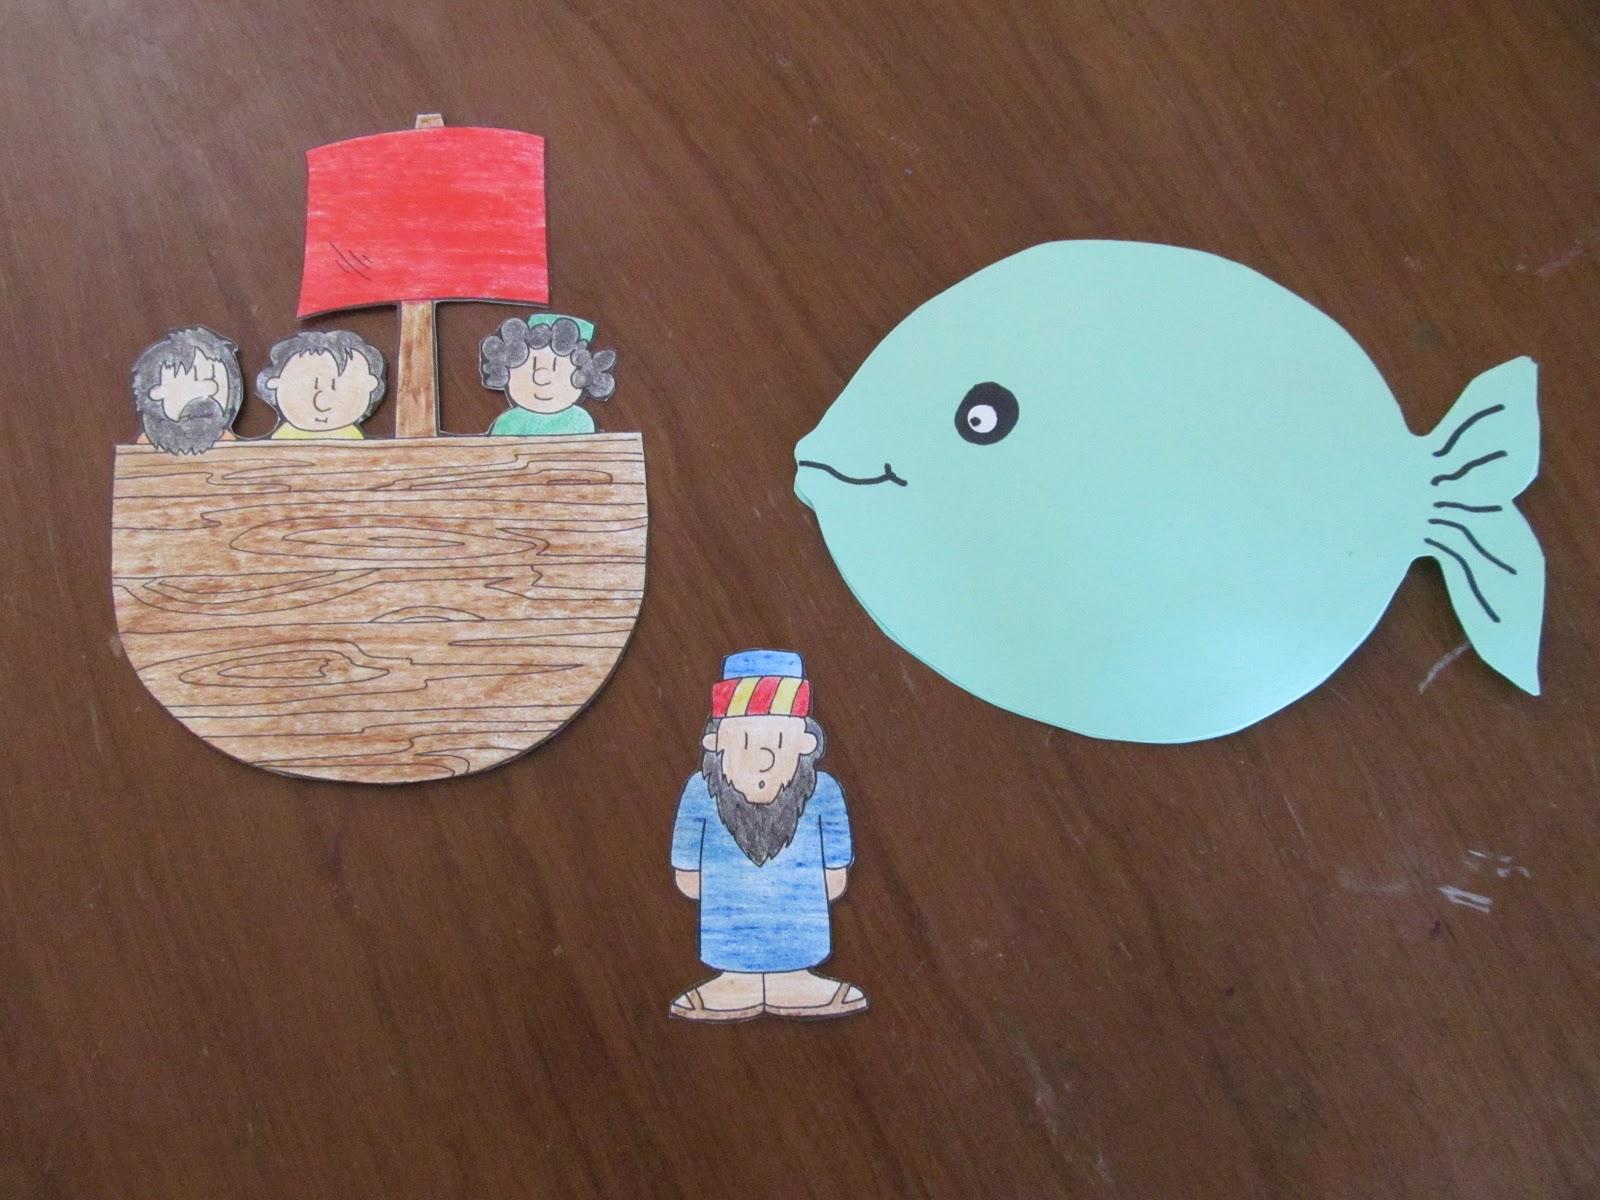 Jonah sunday school craft - Lesson 19 Jonah And The Big Fish Supplies Bible